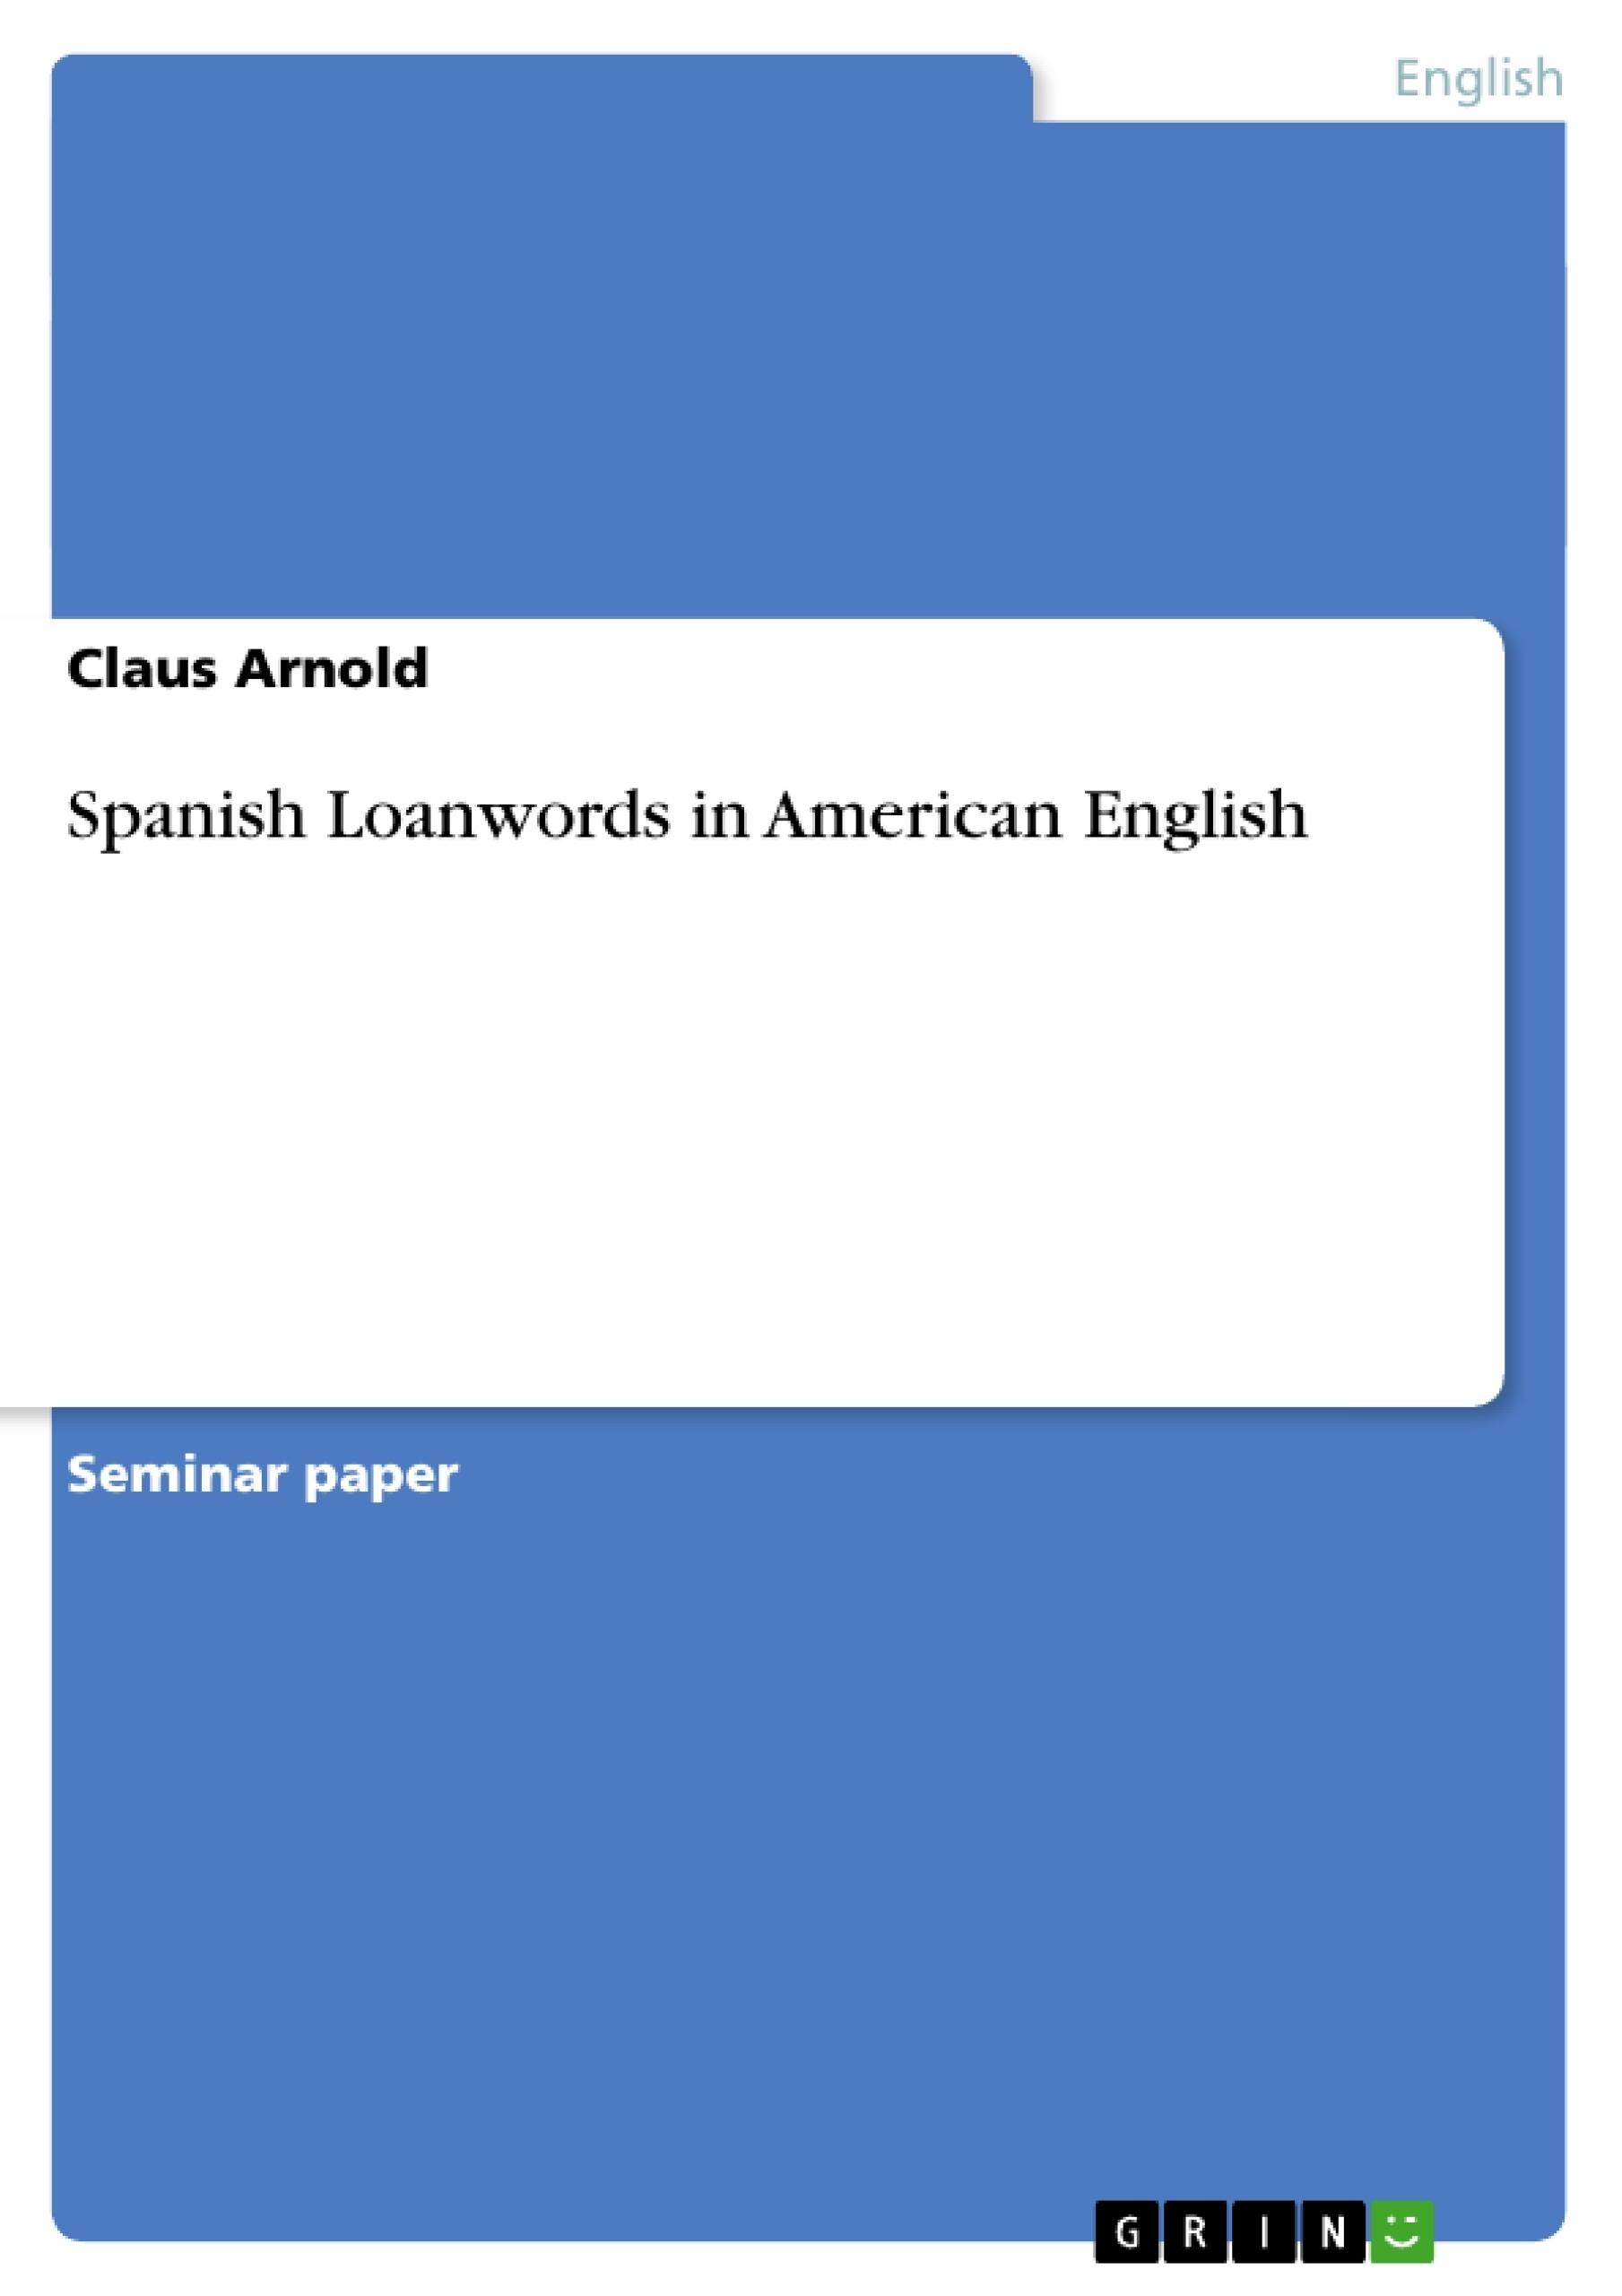 Title: Spanish Loanwords in American English